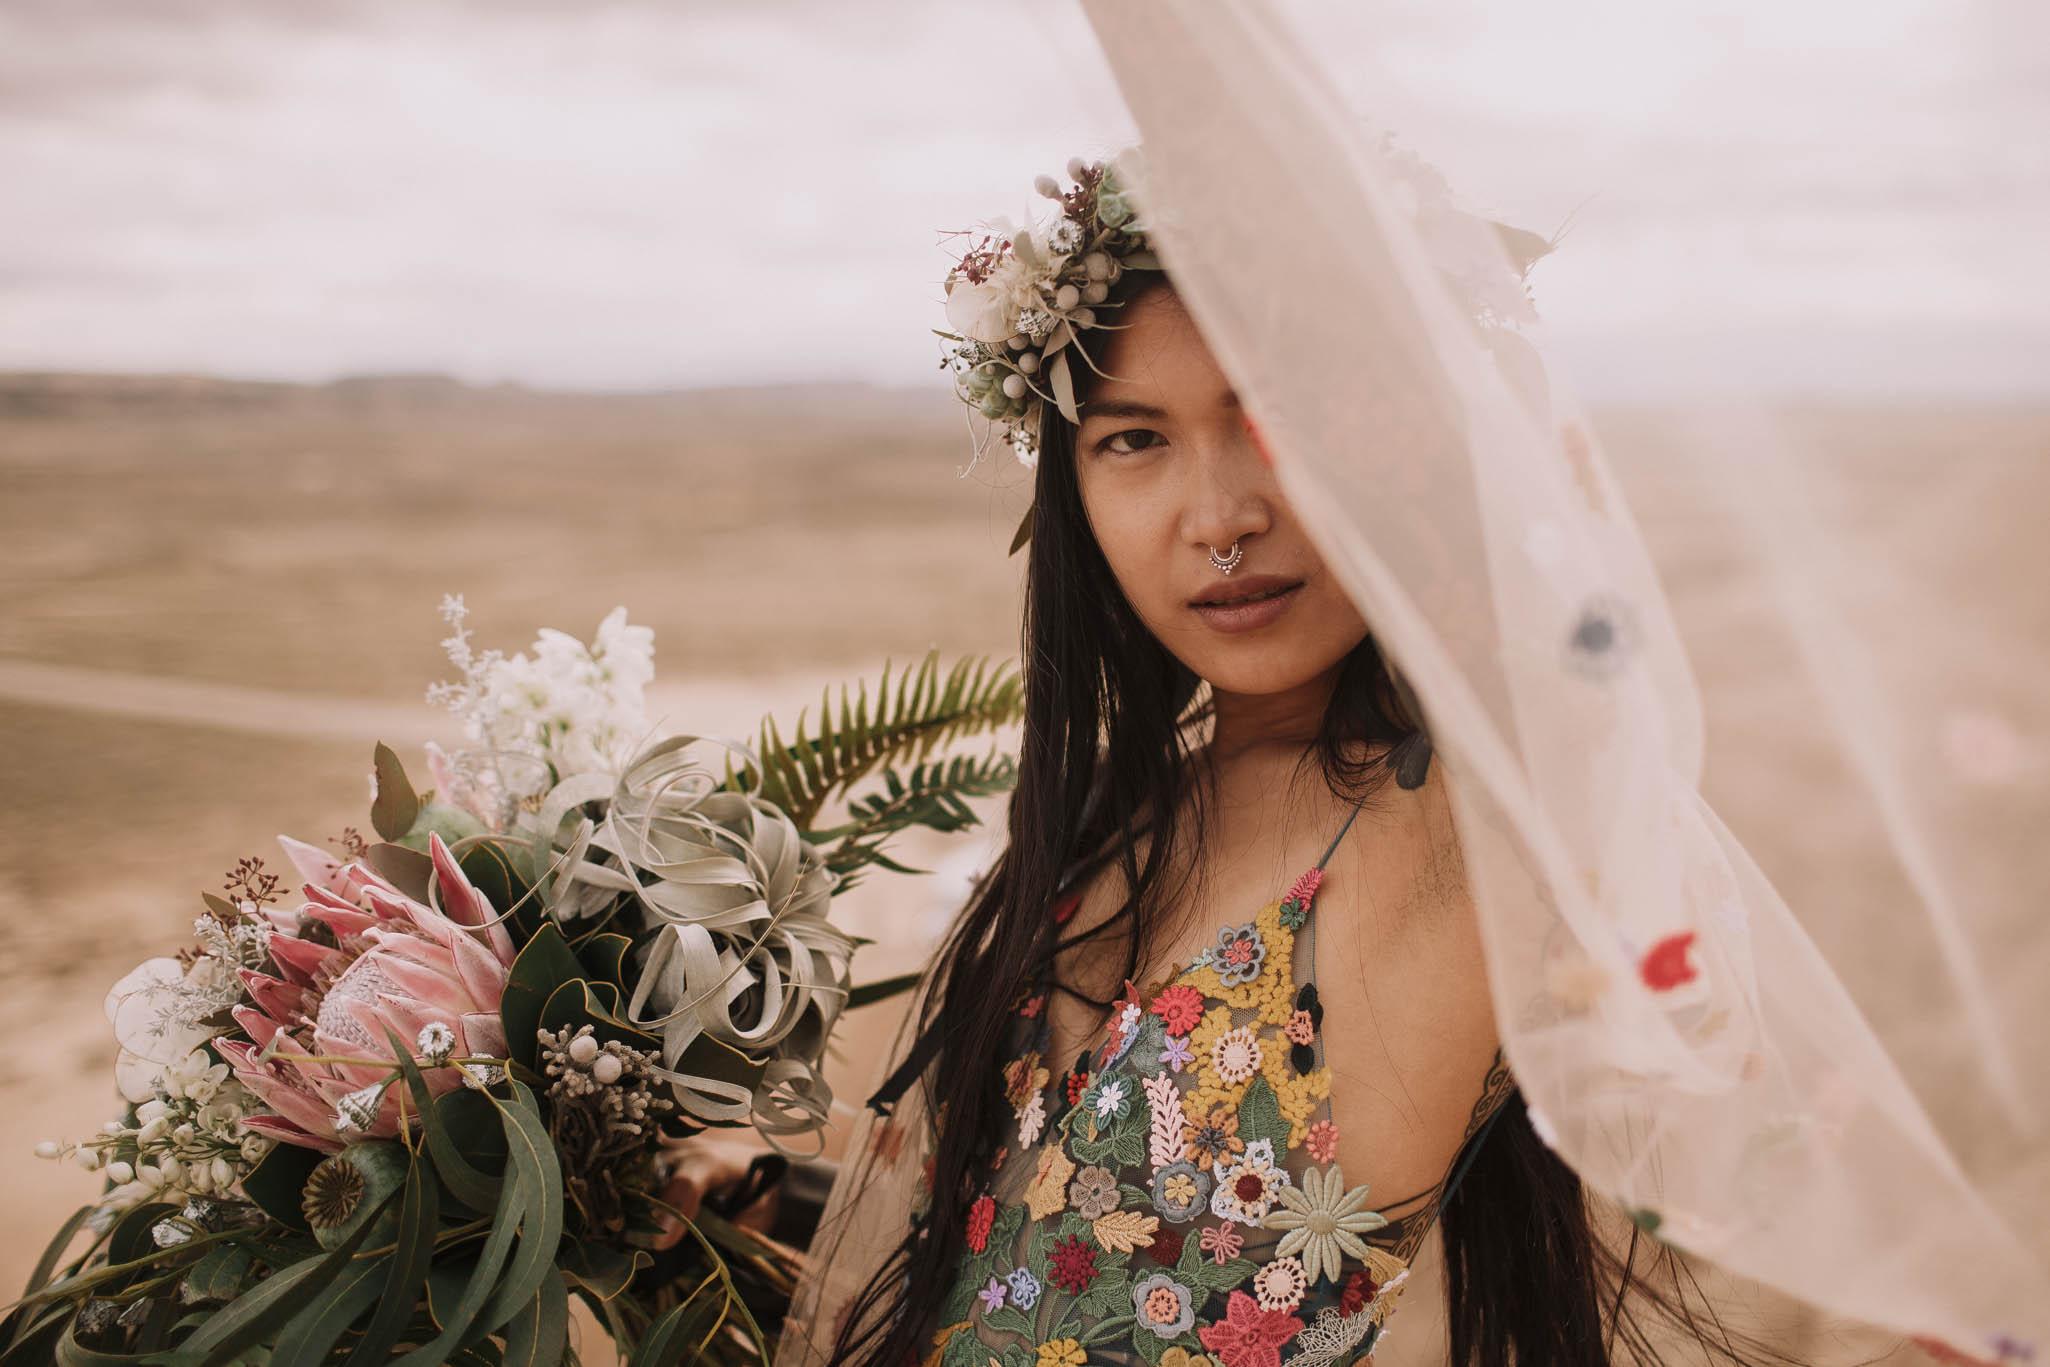 Spain-wedding-photographer-bardenas-reales-jeremy-boyer-photographe-mariage-bordeaux-floral-wedding-dress-robe-119.jpg